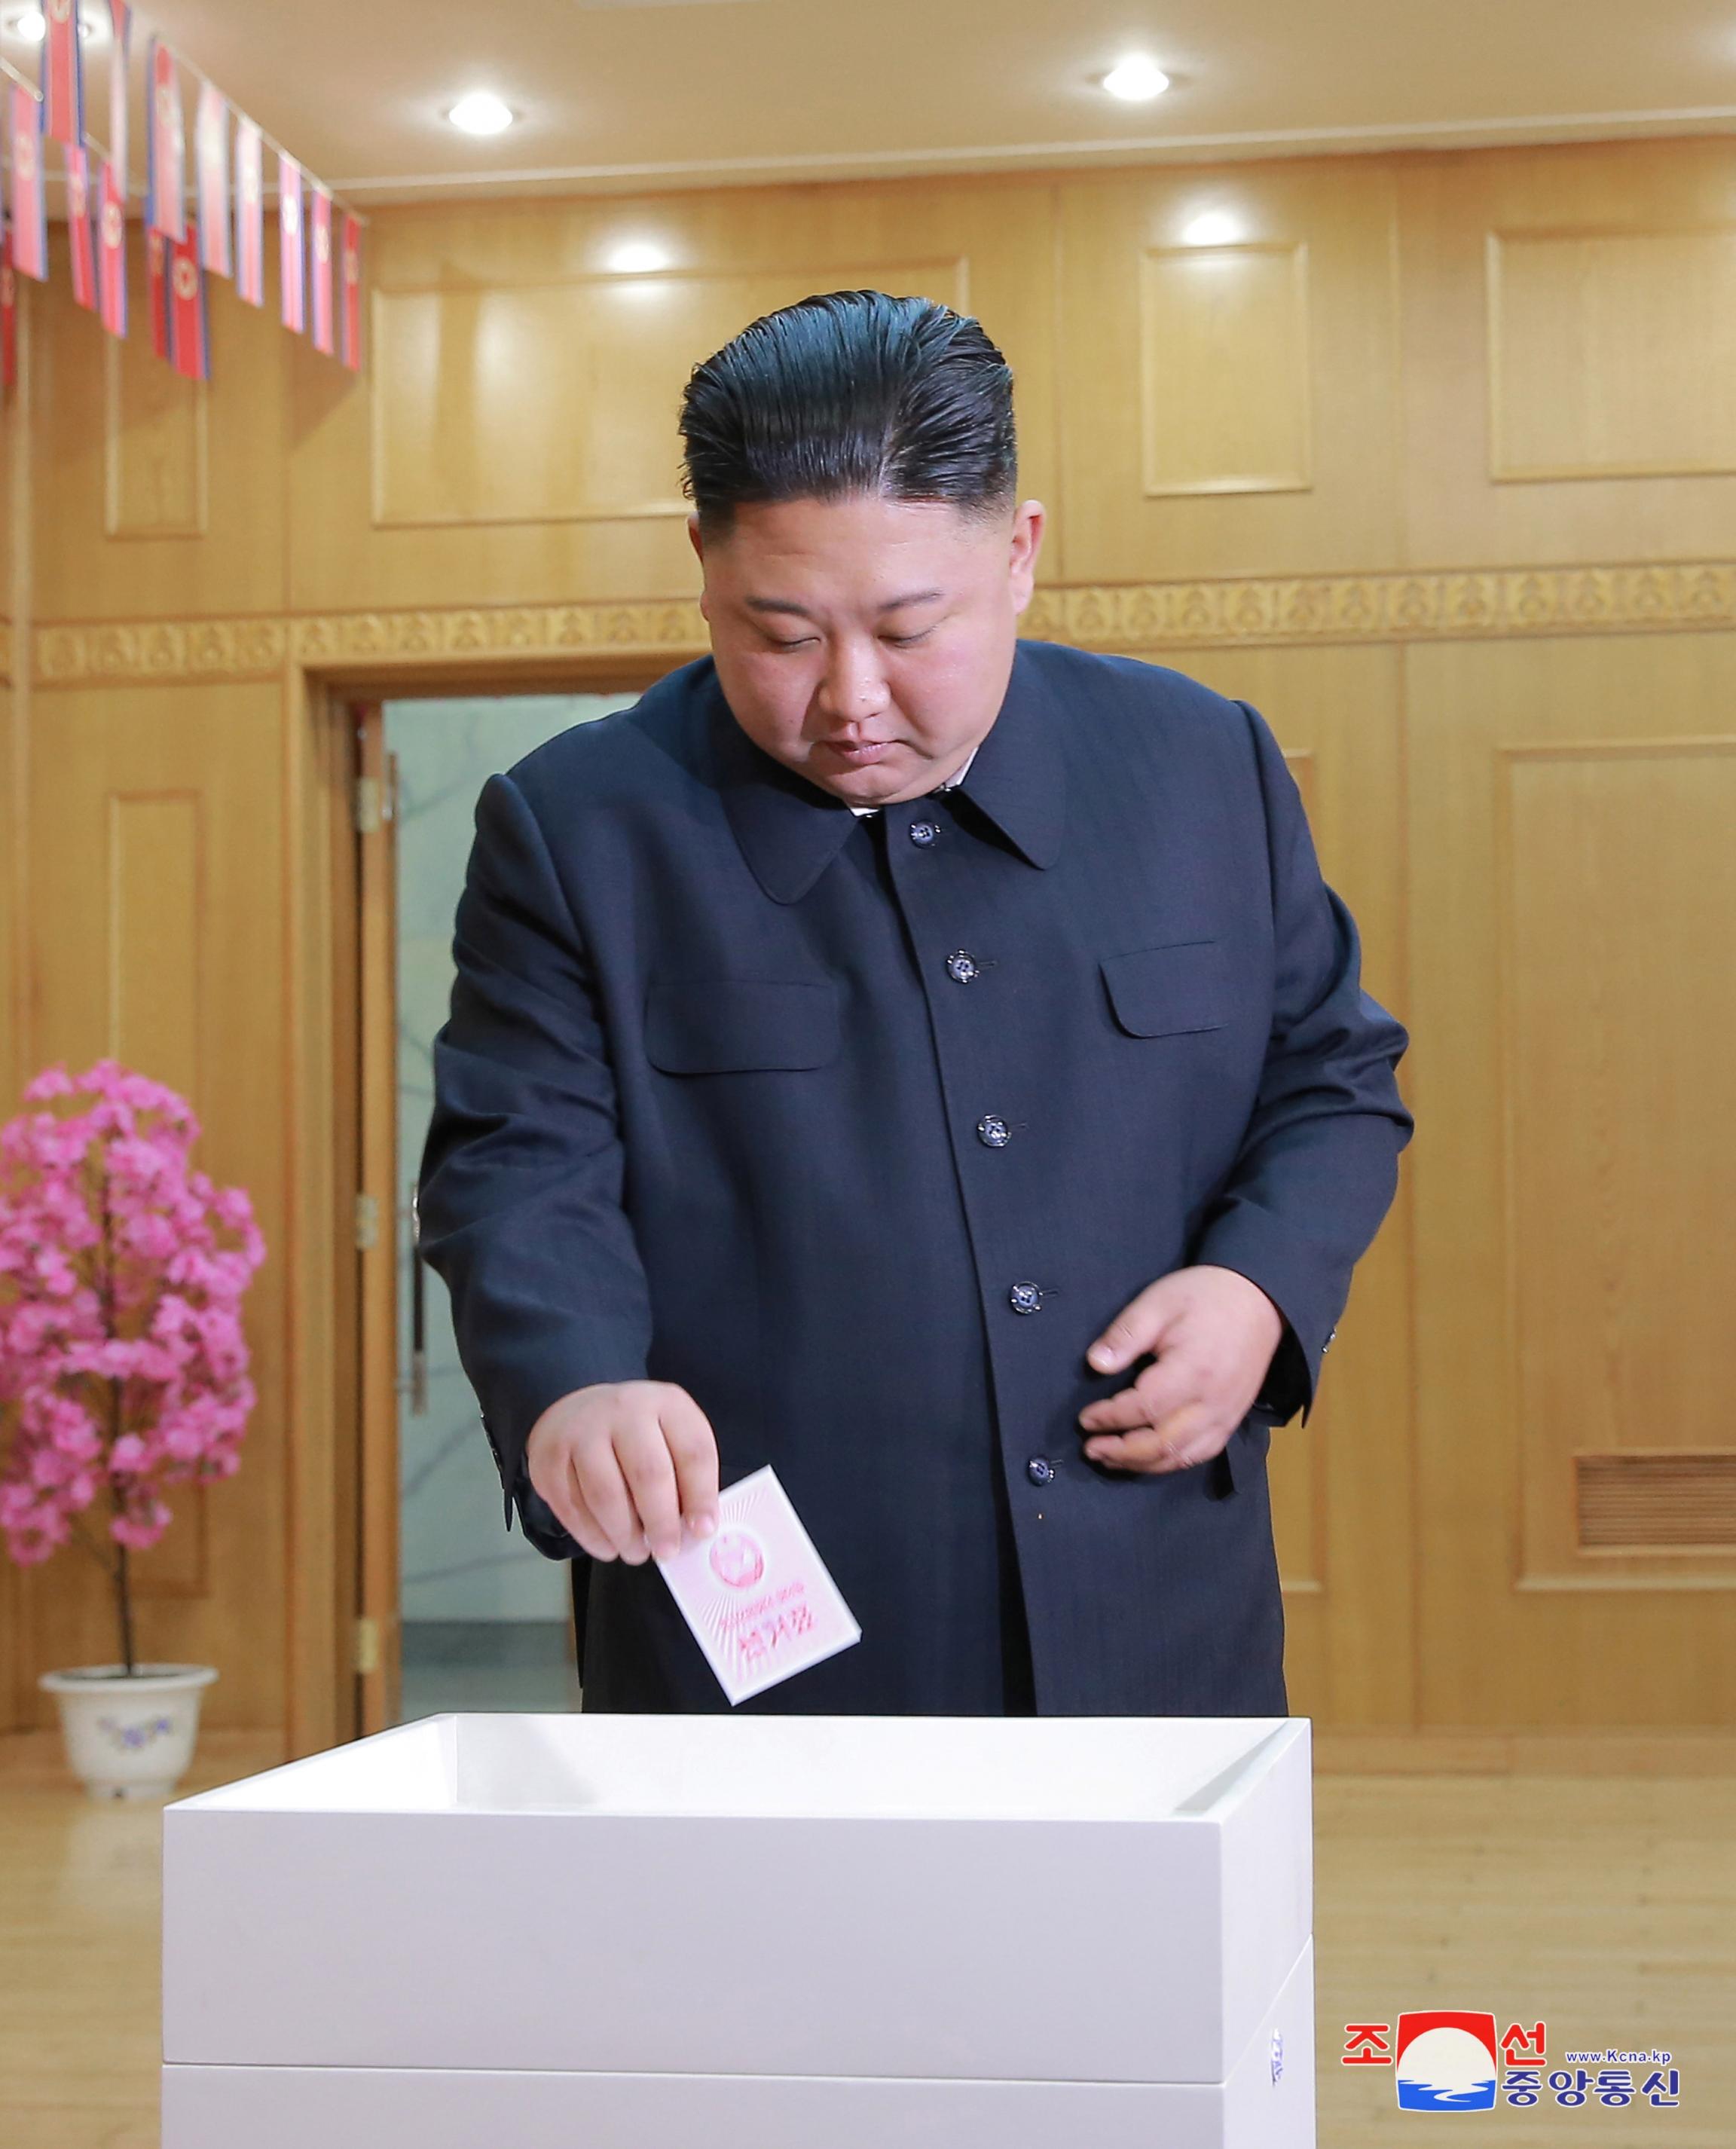 Kim Jon-un casts his ballot